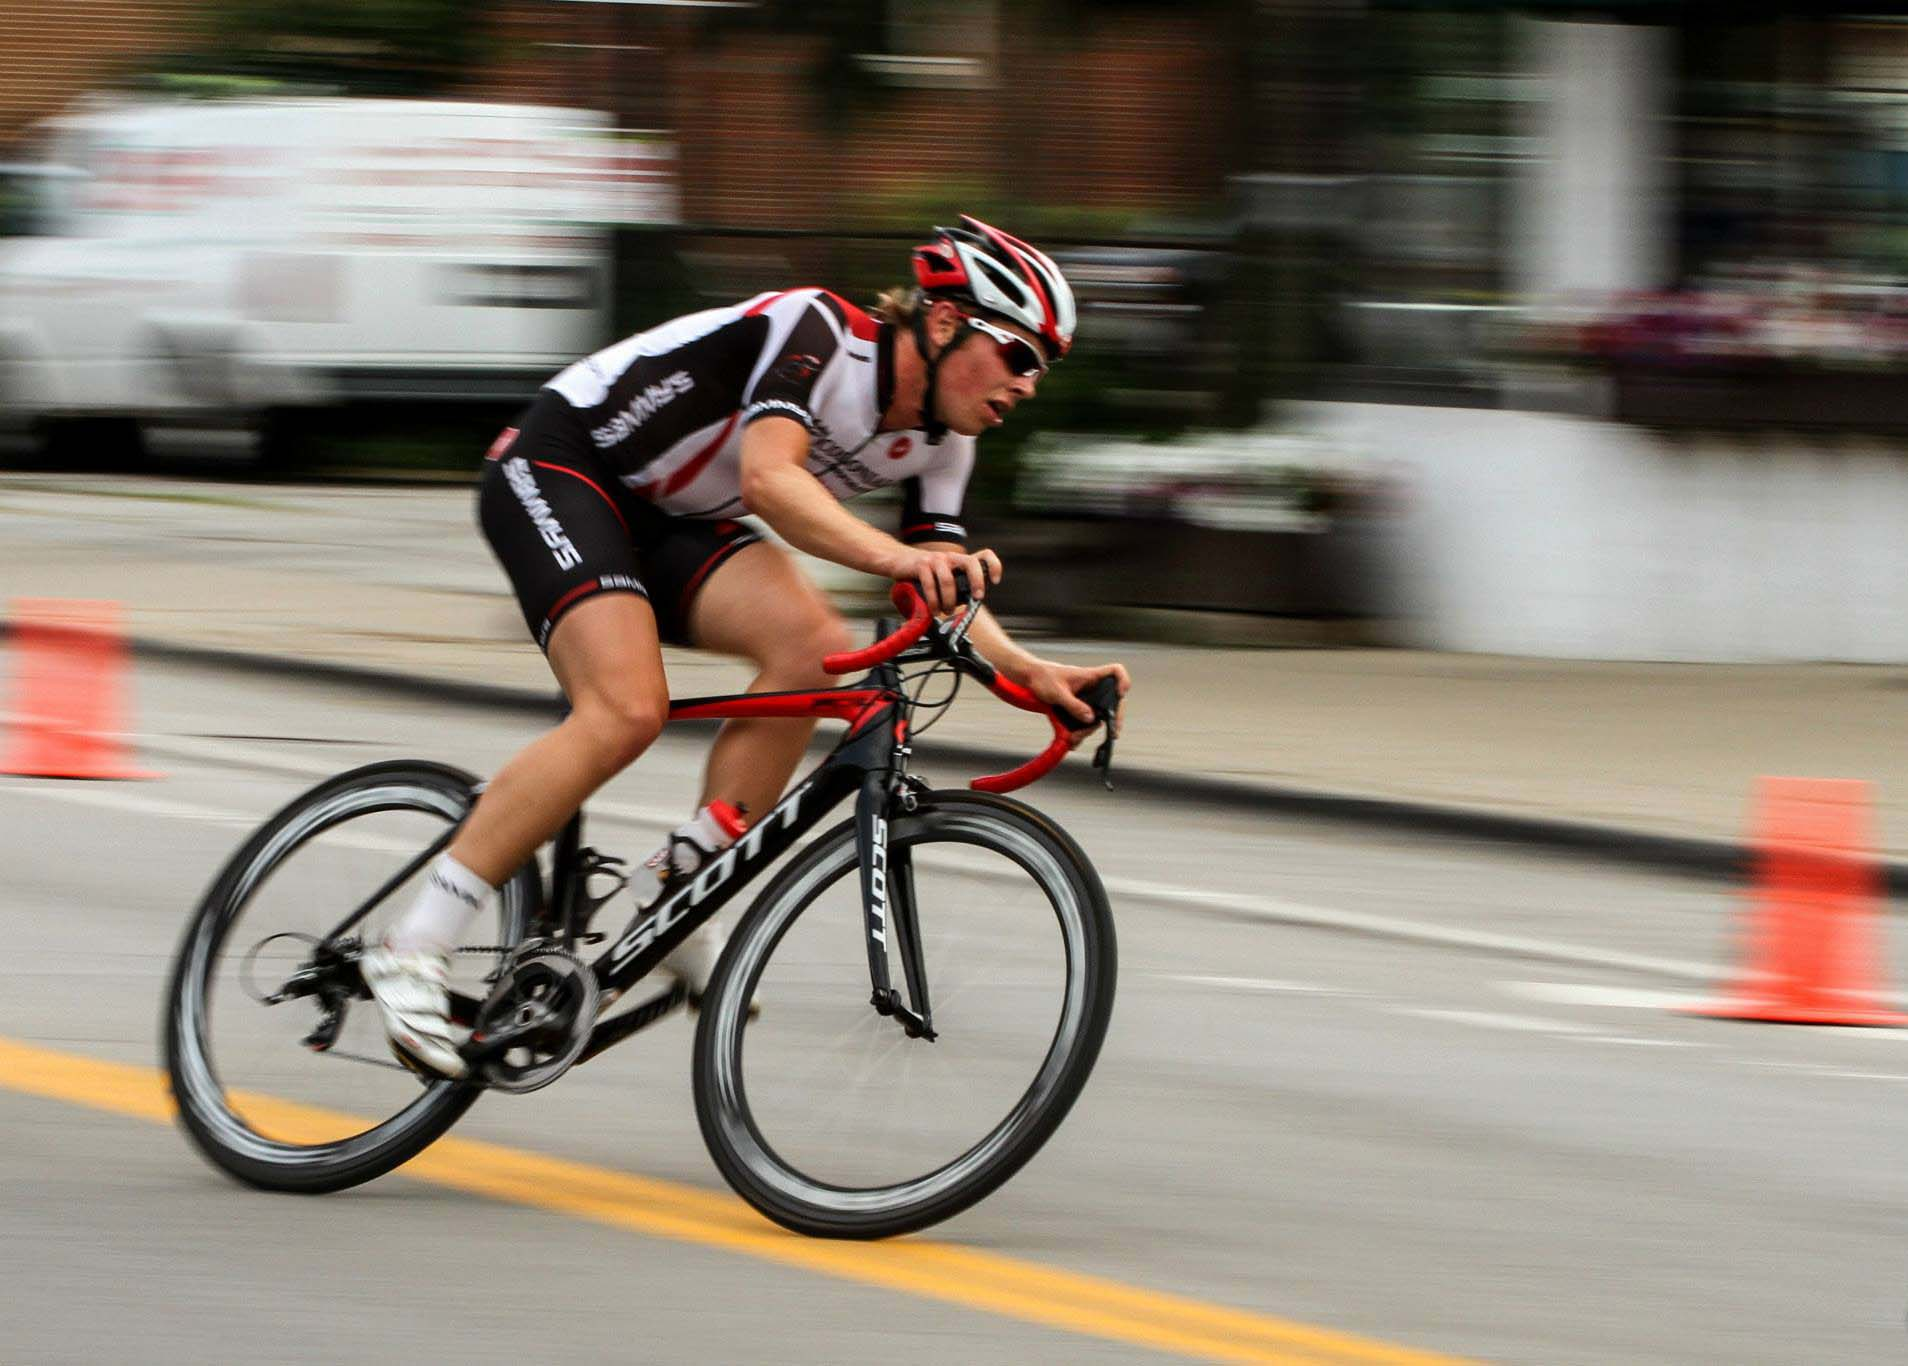 road bike cornering (2)